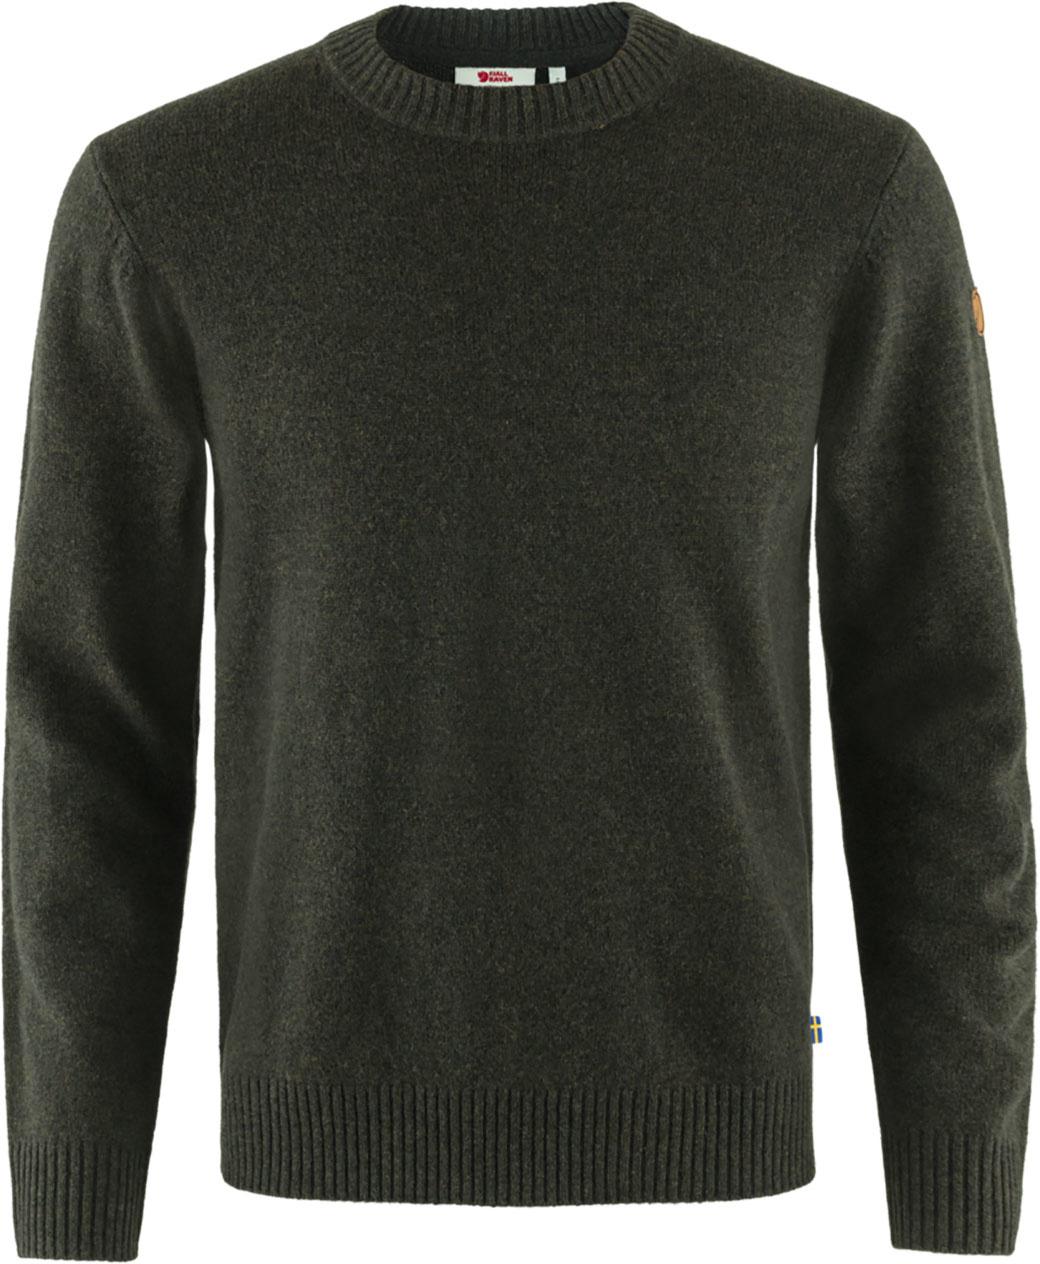 Fjällräven Övik Round-neck Sweater M Dark Olive-1